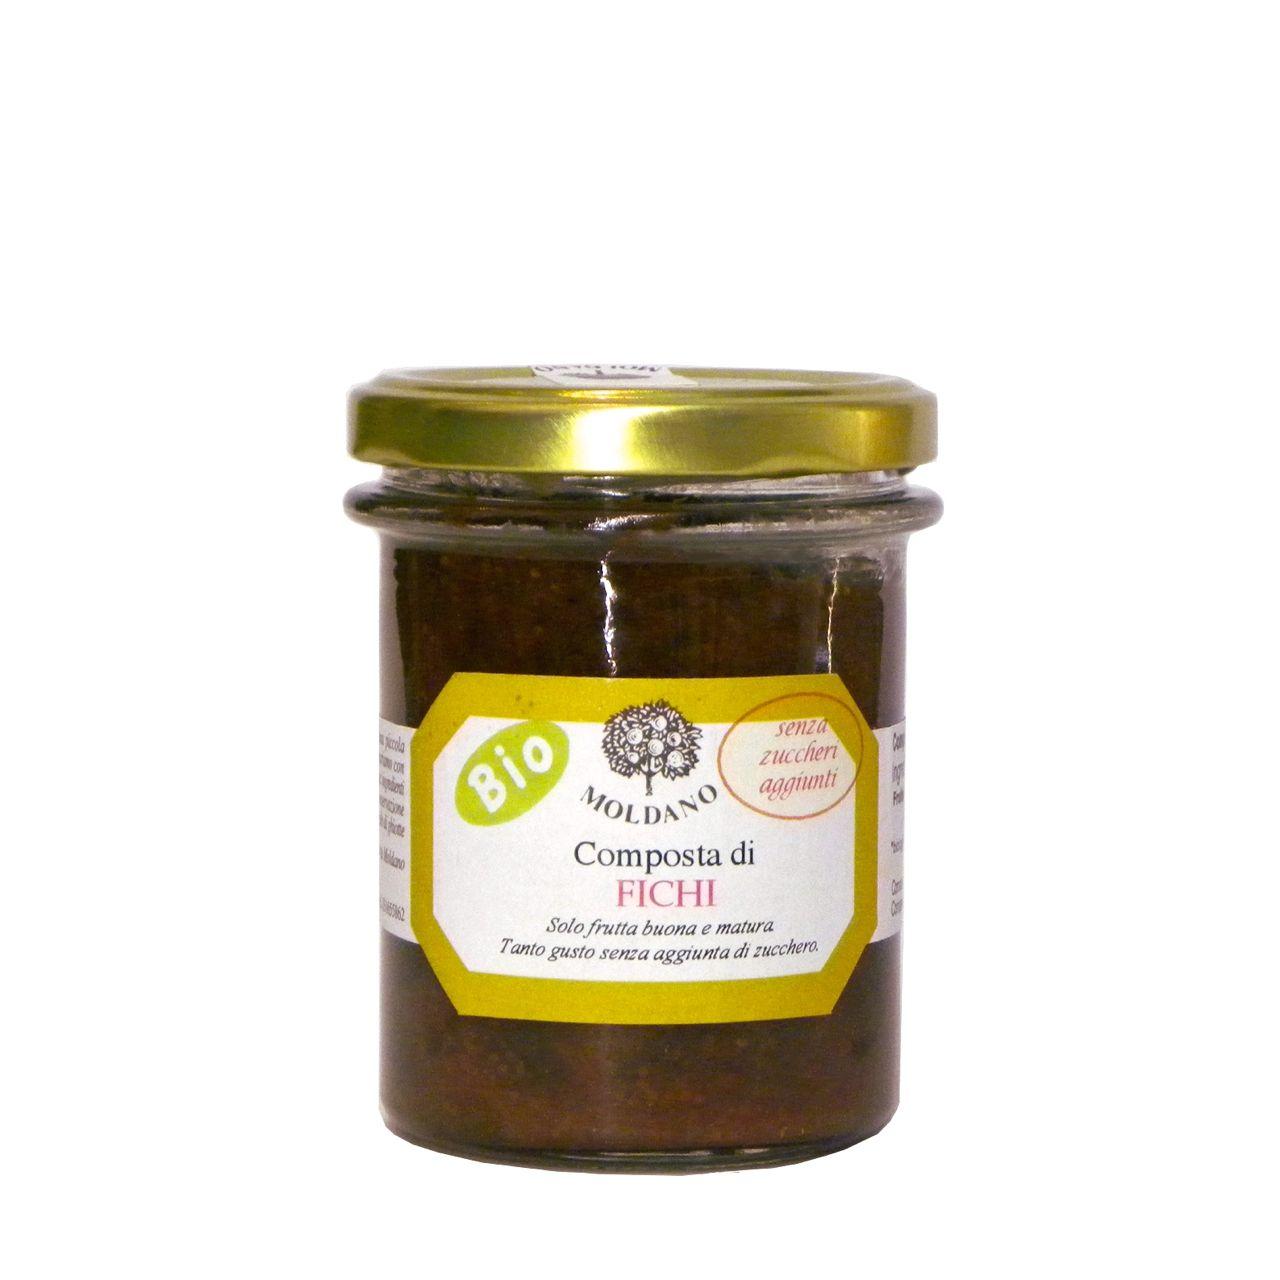 Composta fichi Bio Moldano 190 g senza zucchero aggiunto – No sugar added organic fig jam – Gustorotondo – Italian Food Boutique